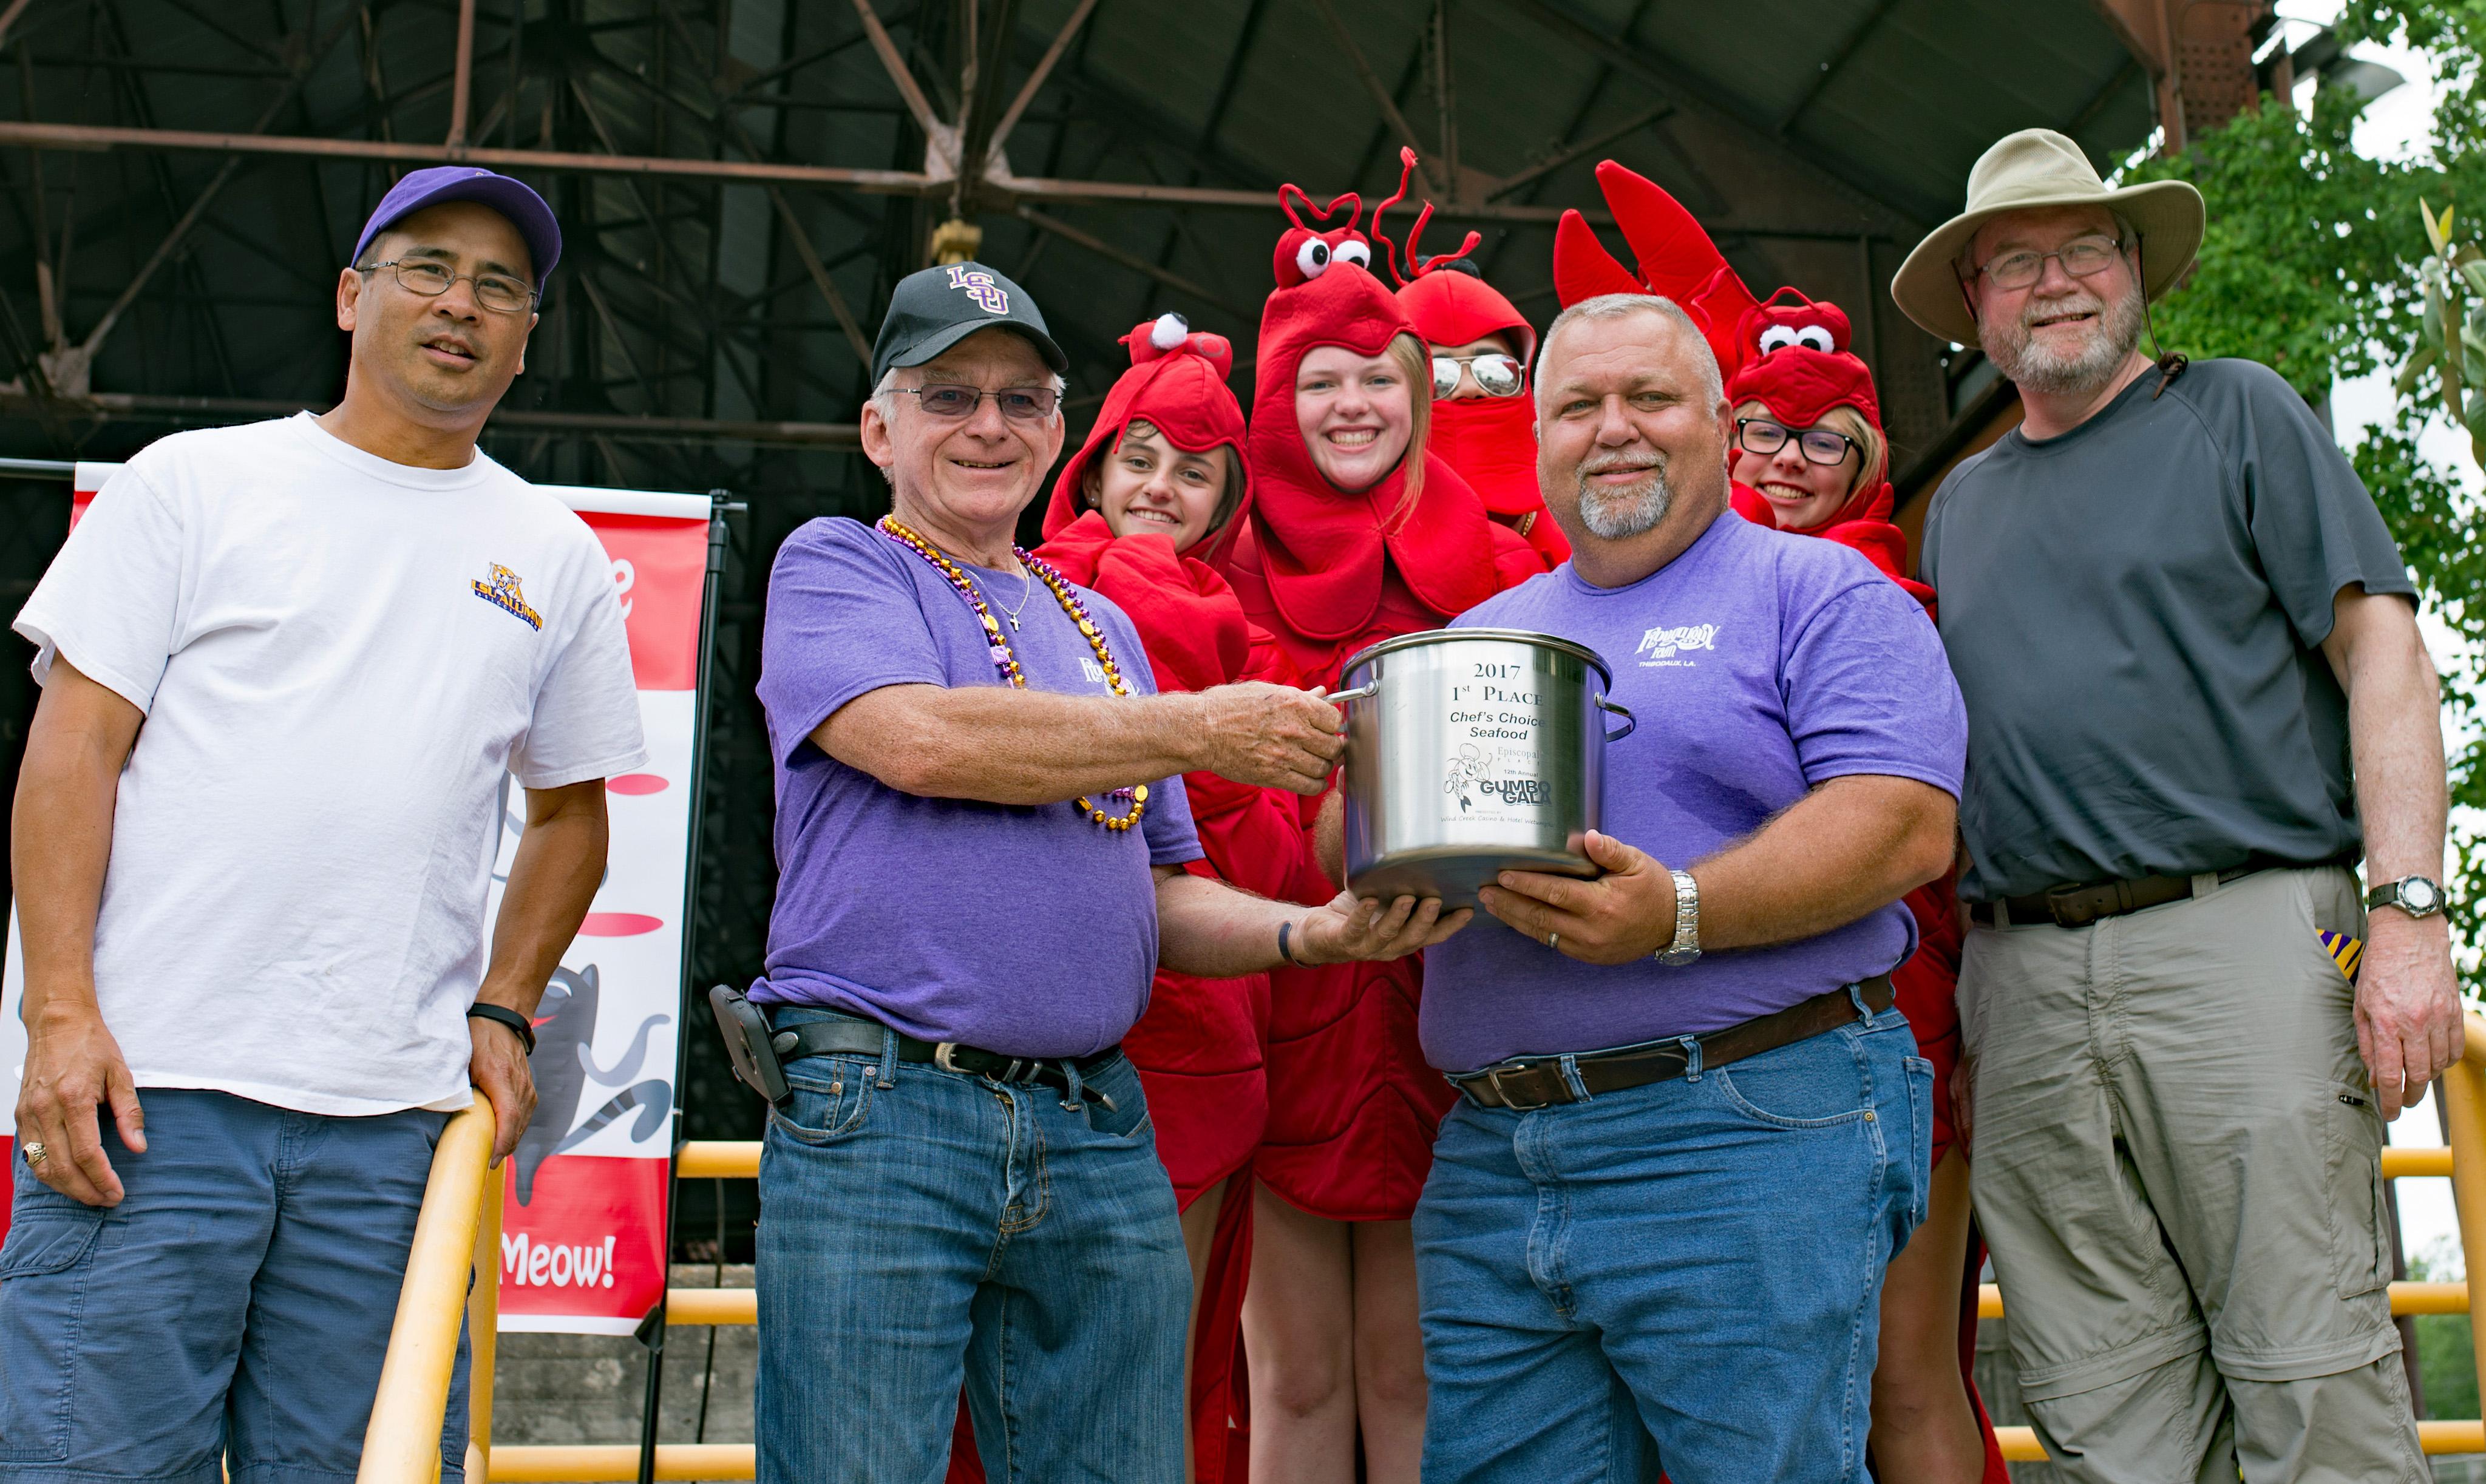 Winner Chefs Choice Seafood LSU